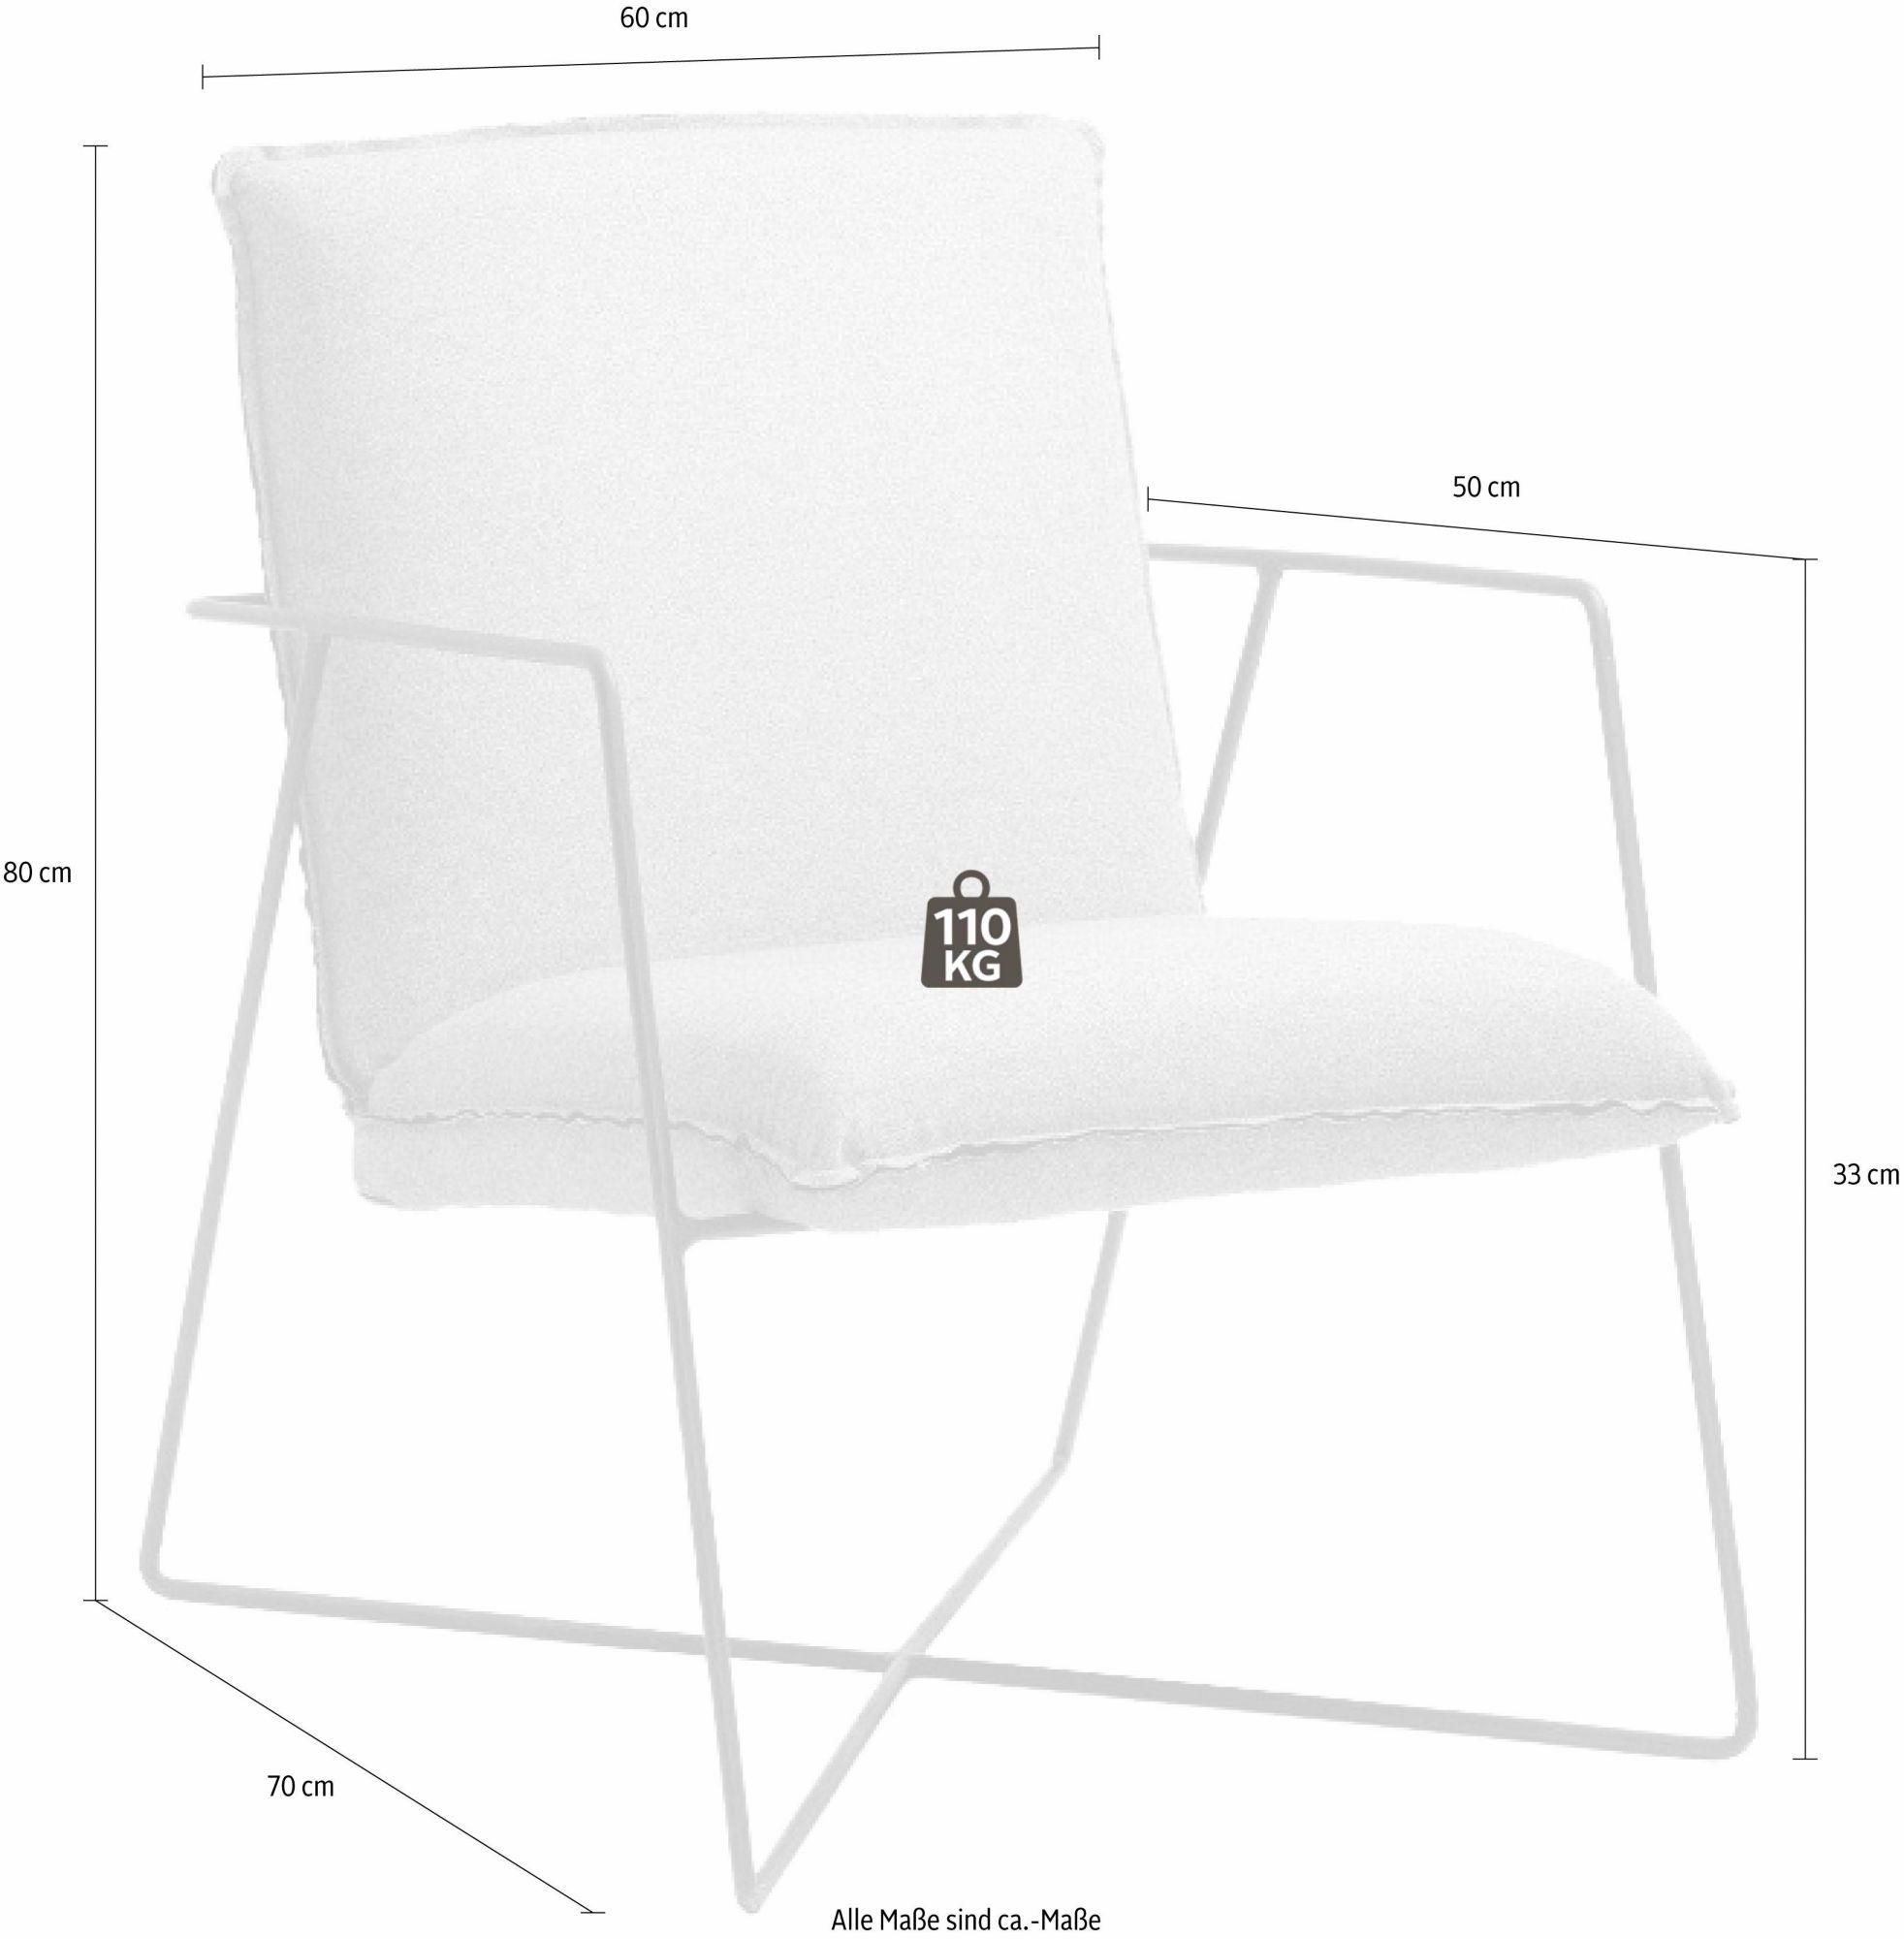 FAVORIT Favorit Stuhl »Bari« in 3 Farben